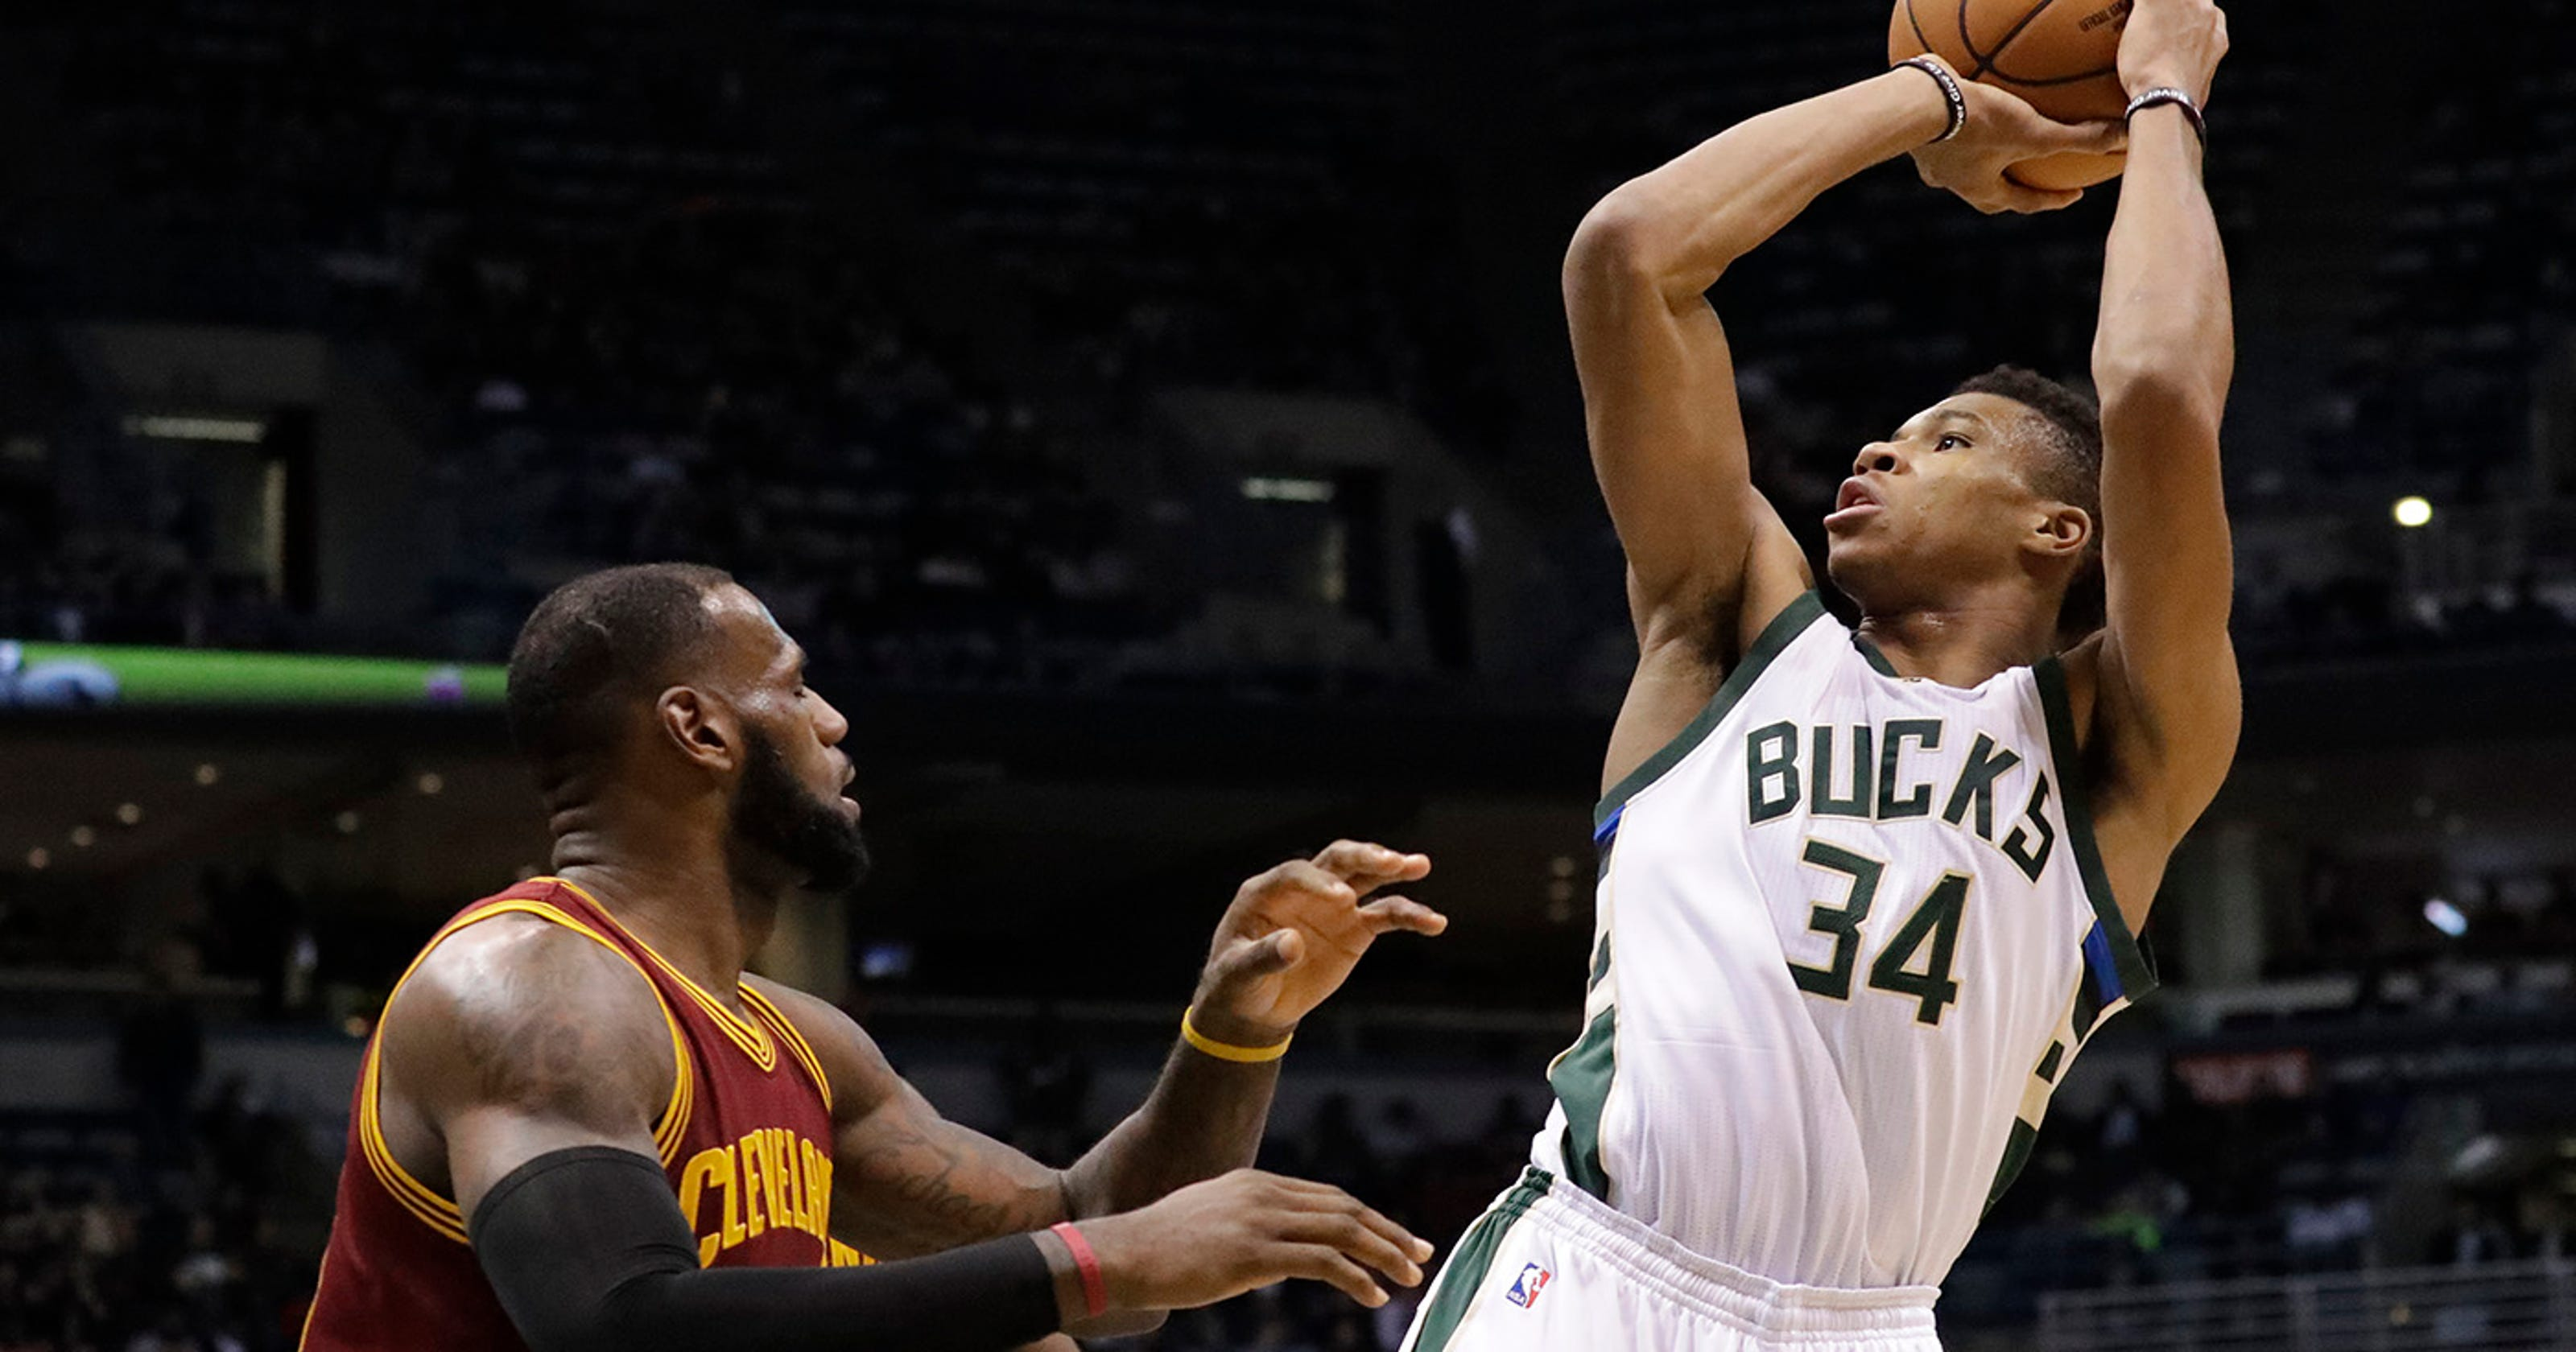 Bucks to host Cavaliers in home opener on Oct. 20 46be57605